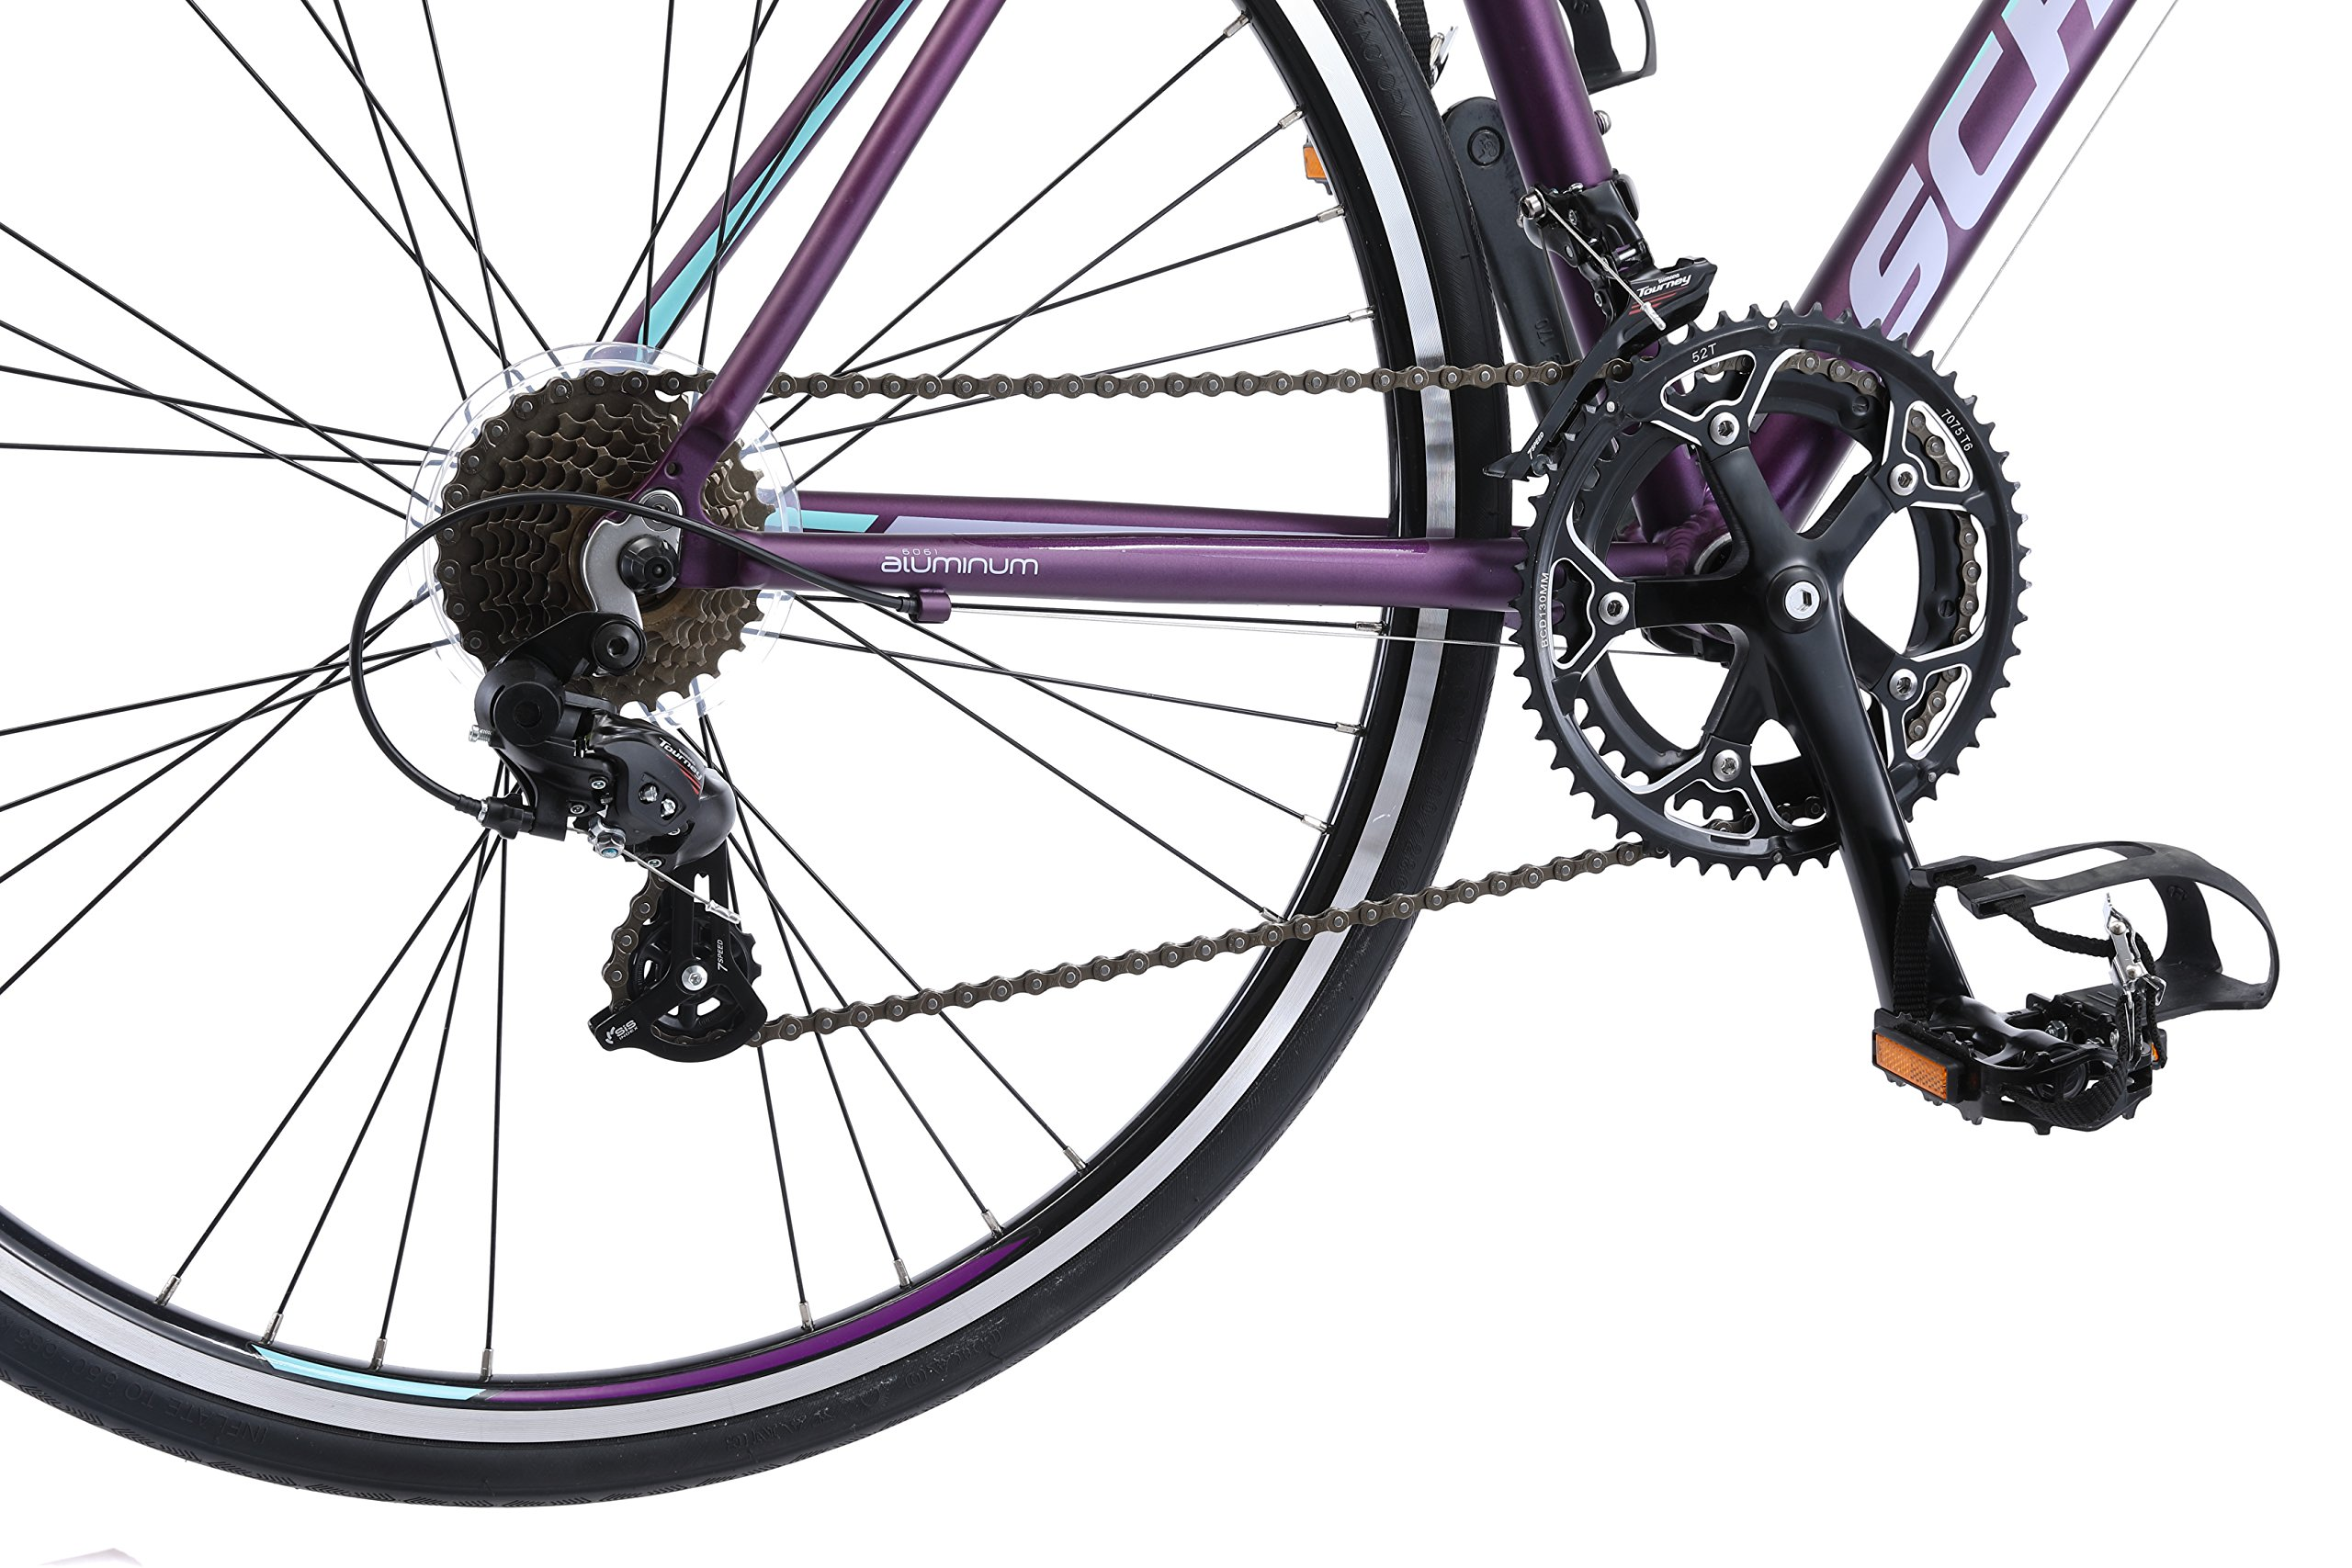 Schwinn Volare 1400 Road 700C Wheel Bicycle, Matte Purple, 48 cm/One Size by Schwinn (Image #4)